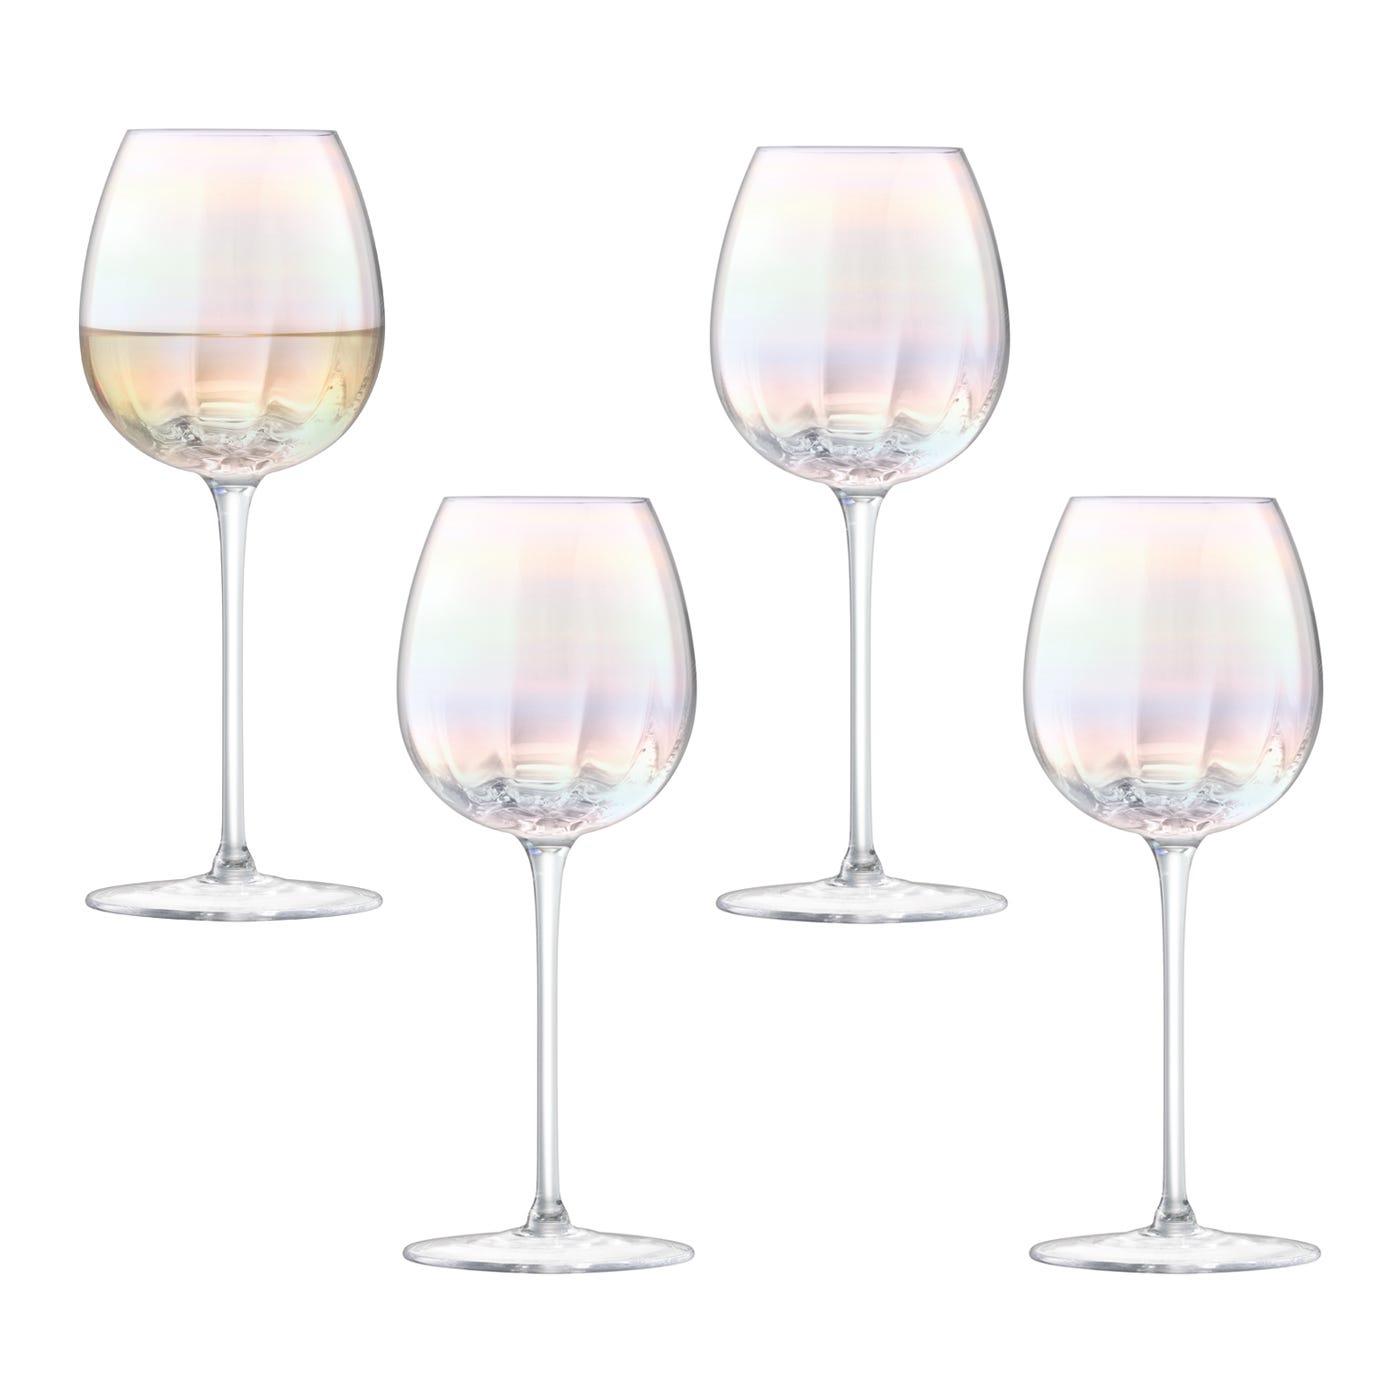 Lsa International Pearl White Wine Glass Set Of 4 Heal S